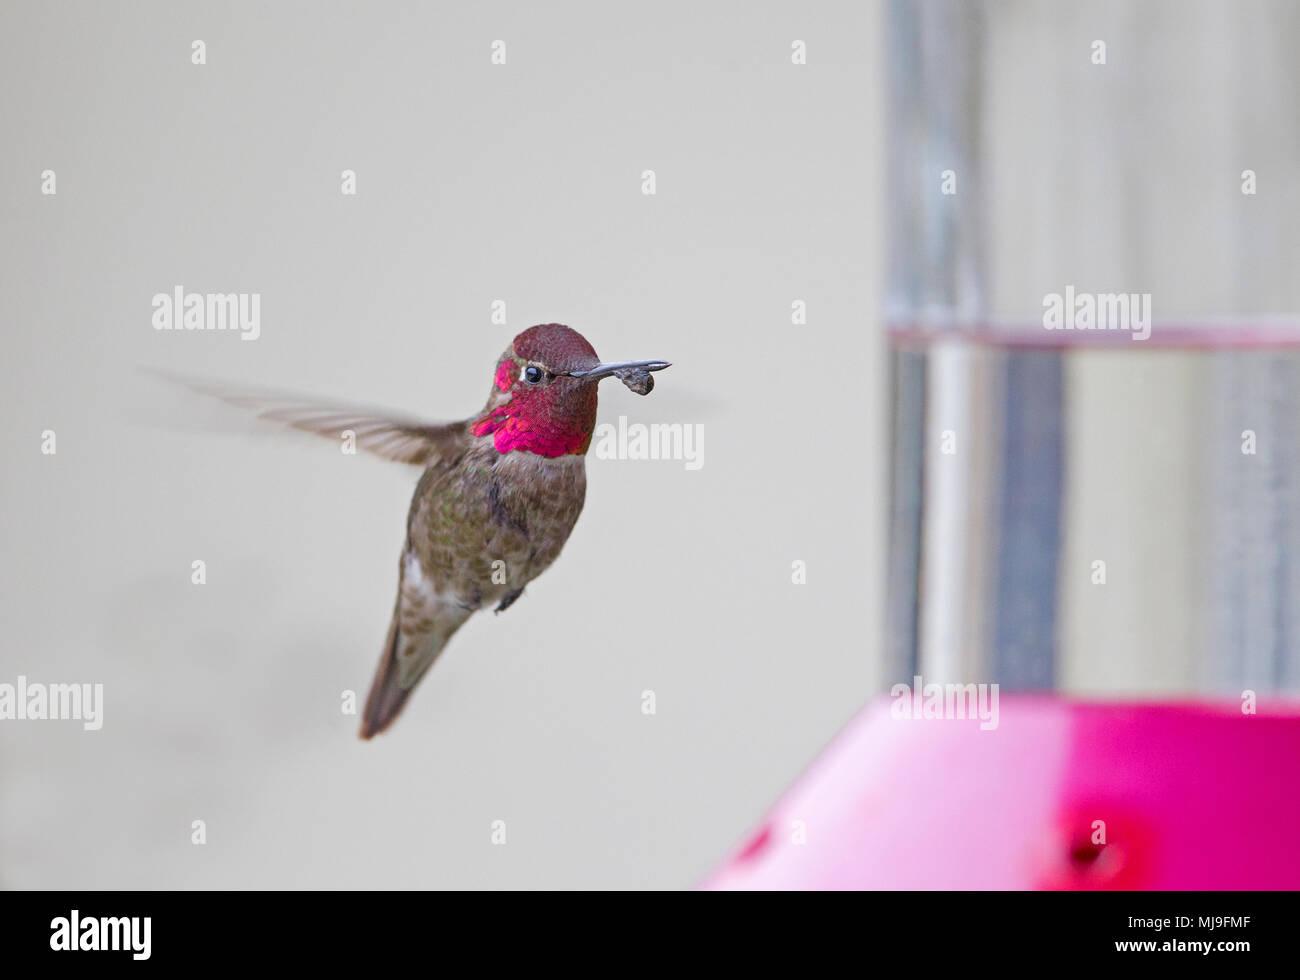 Anna's Hummingbird Male with Abnormal Beak - Stock Image